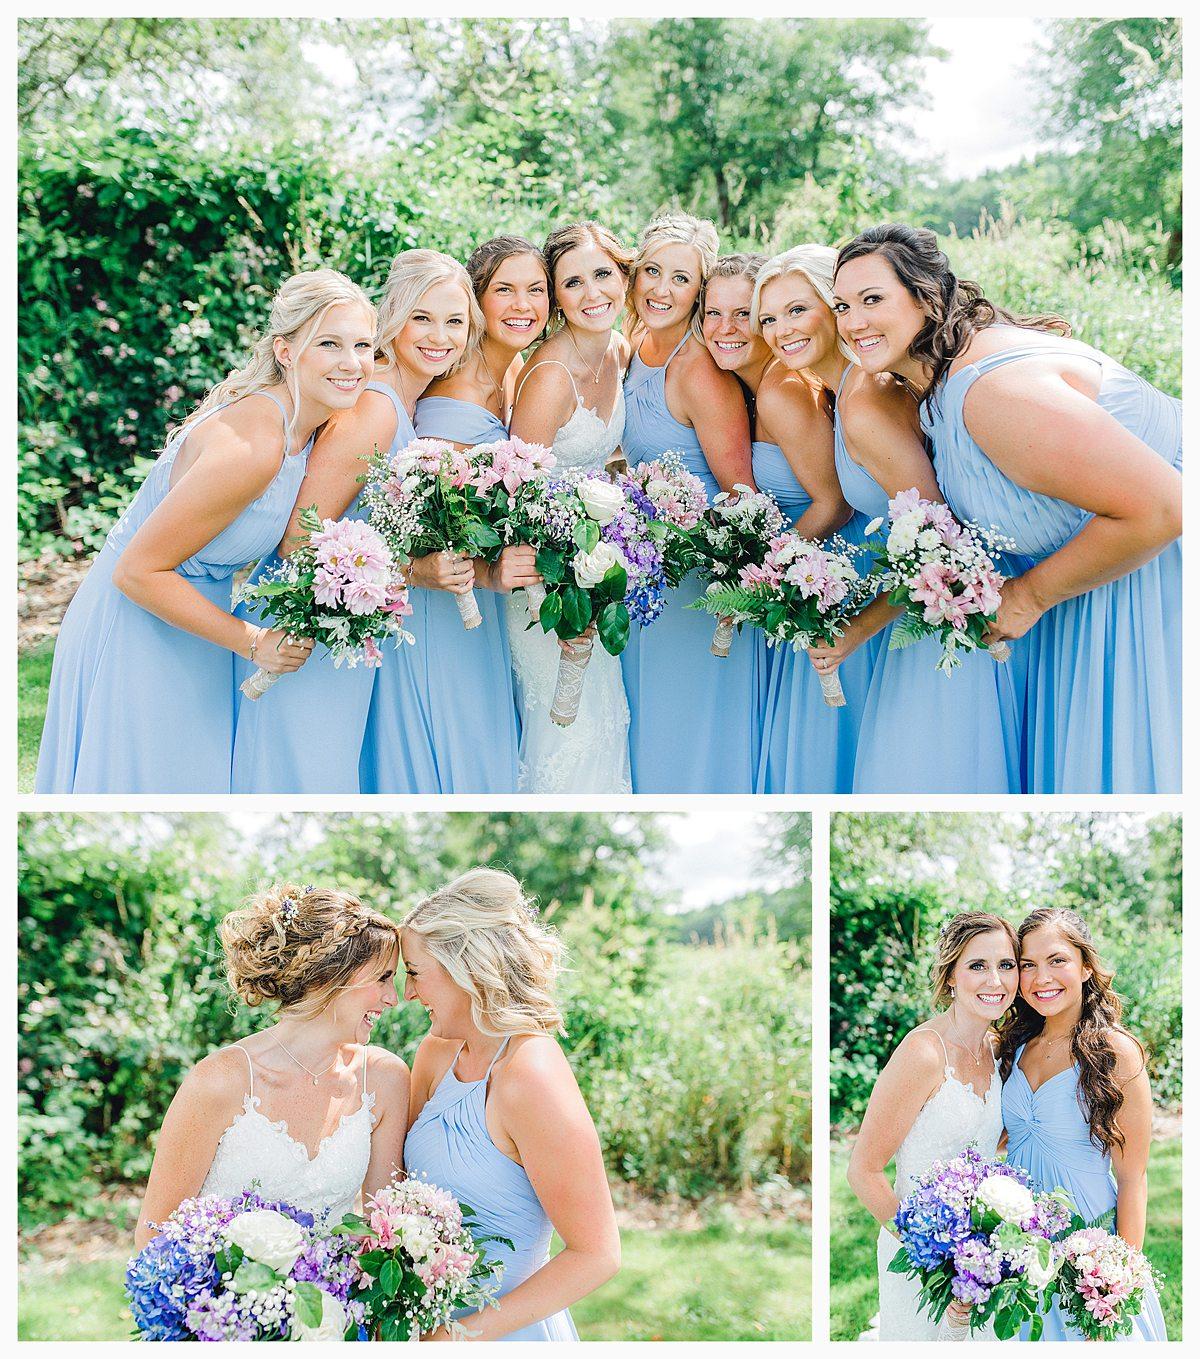 Rustic Coastal Blue Wedding in Southwest Washington, Emma Rose Company, Seattle and Portland Wedding Photographer, Light and Airy_0092.jpg